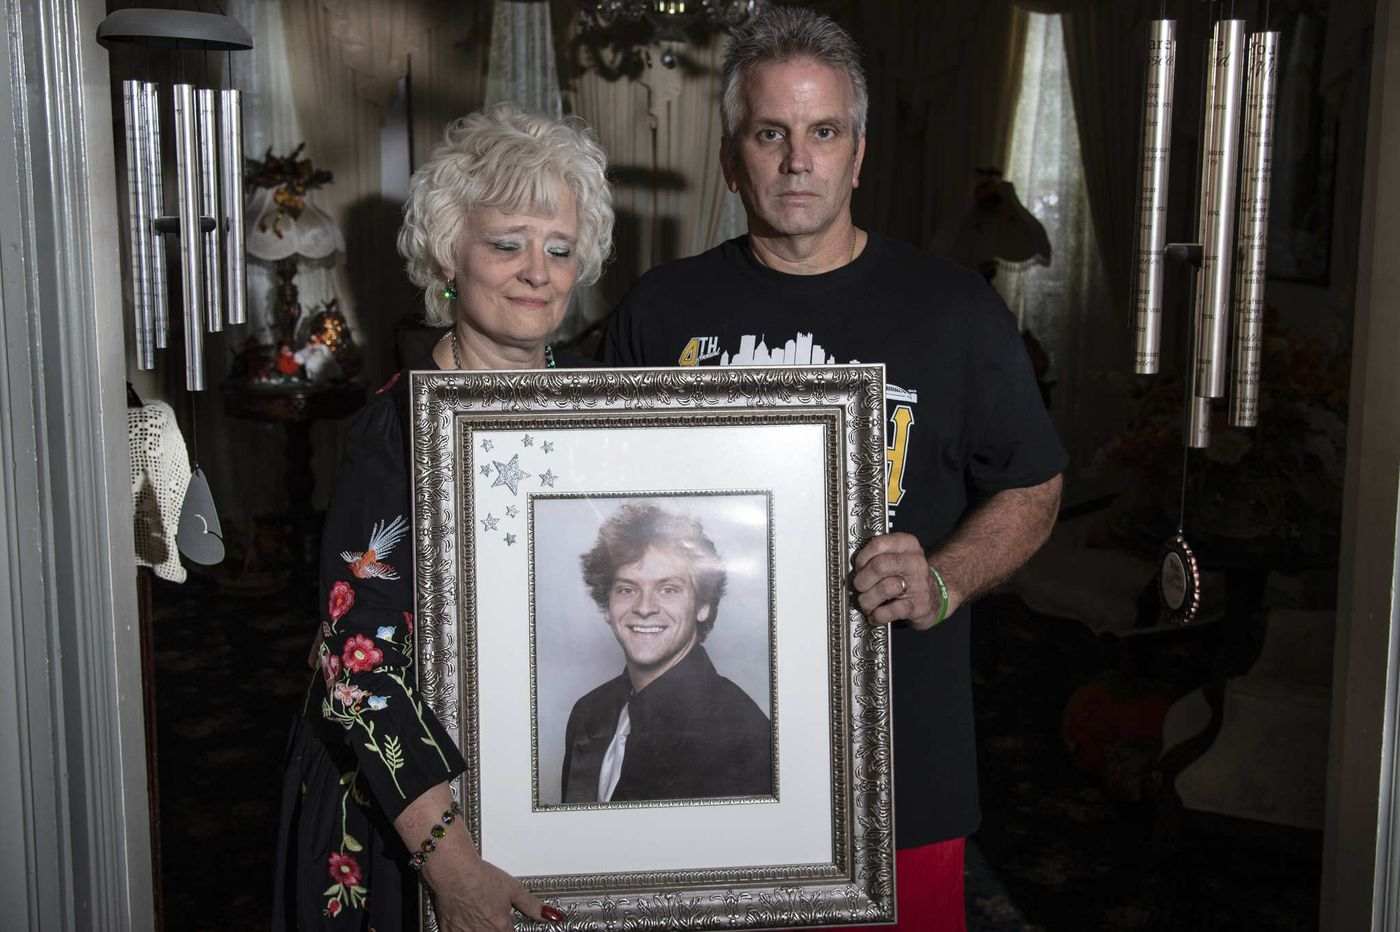 Corey Leech died for the Catholic Church's sins. His sacrifice mattered. | Maria Panaritis